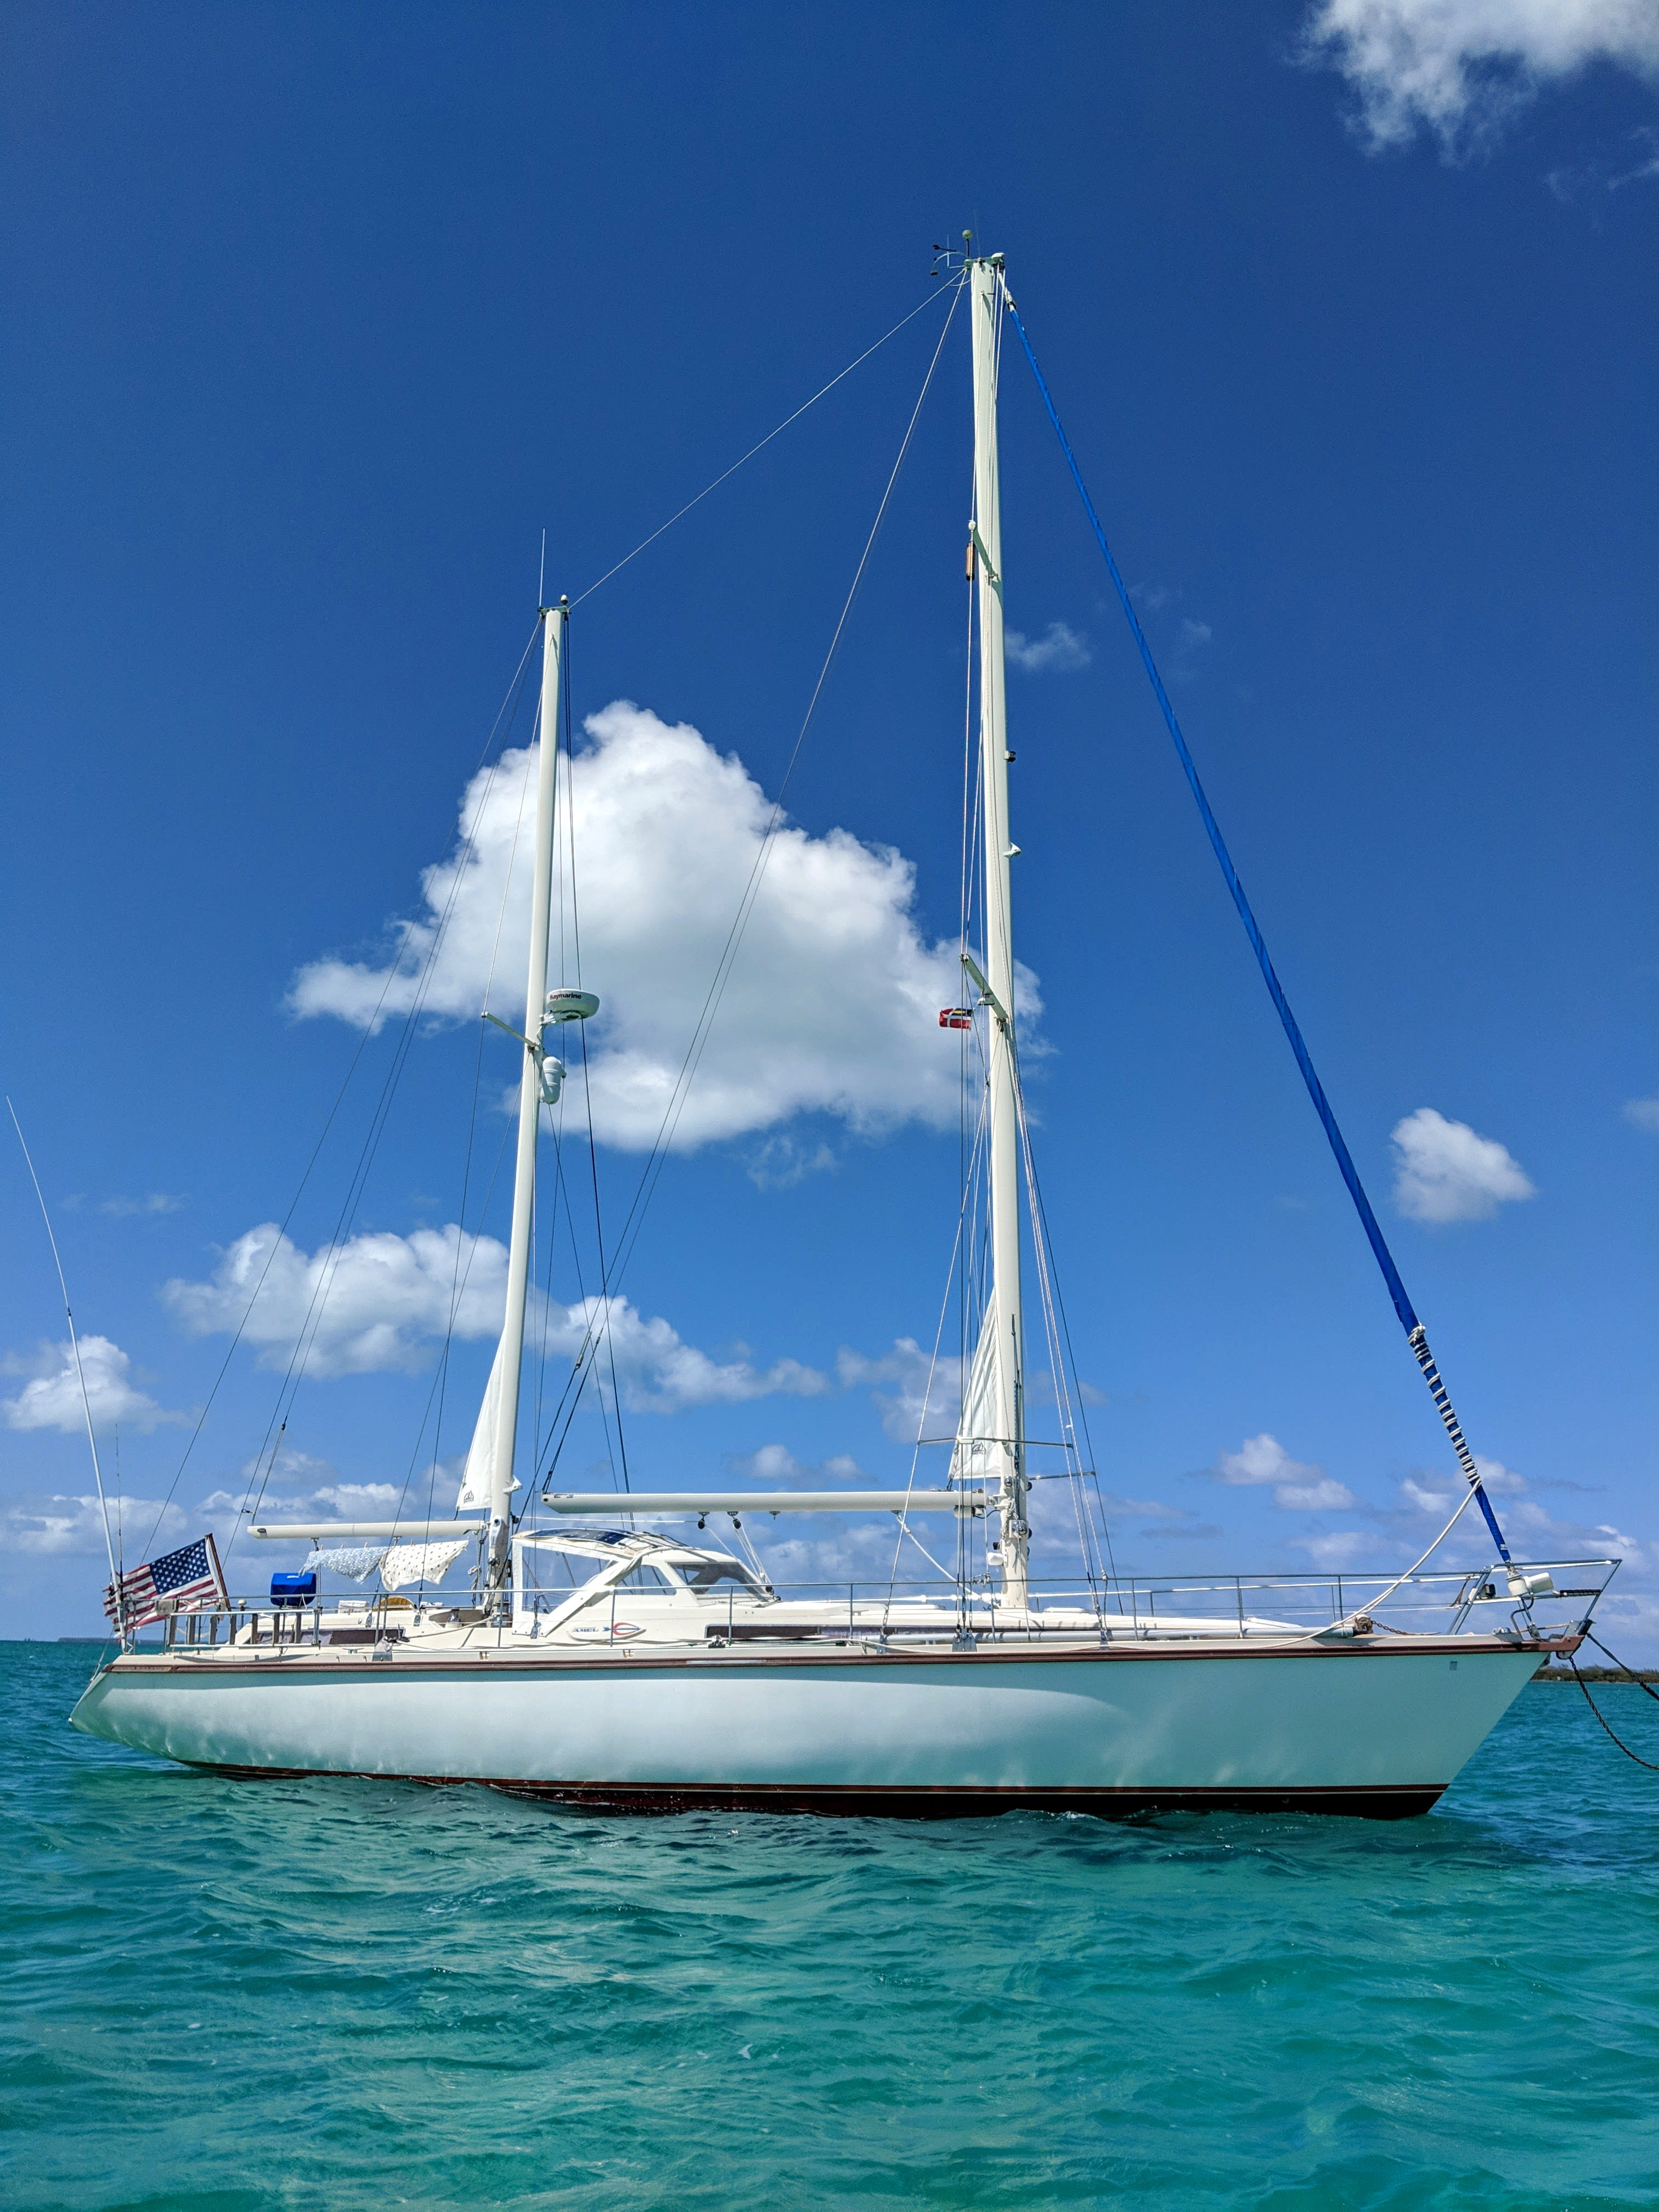 An Amel Super Maramu anchored in tropical waters